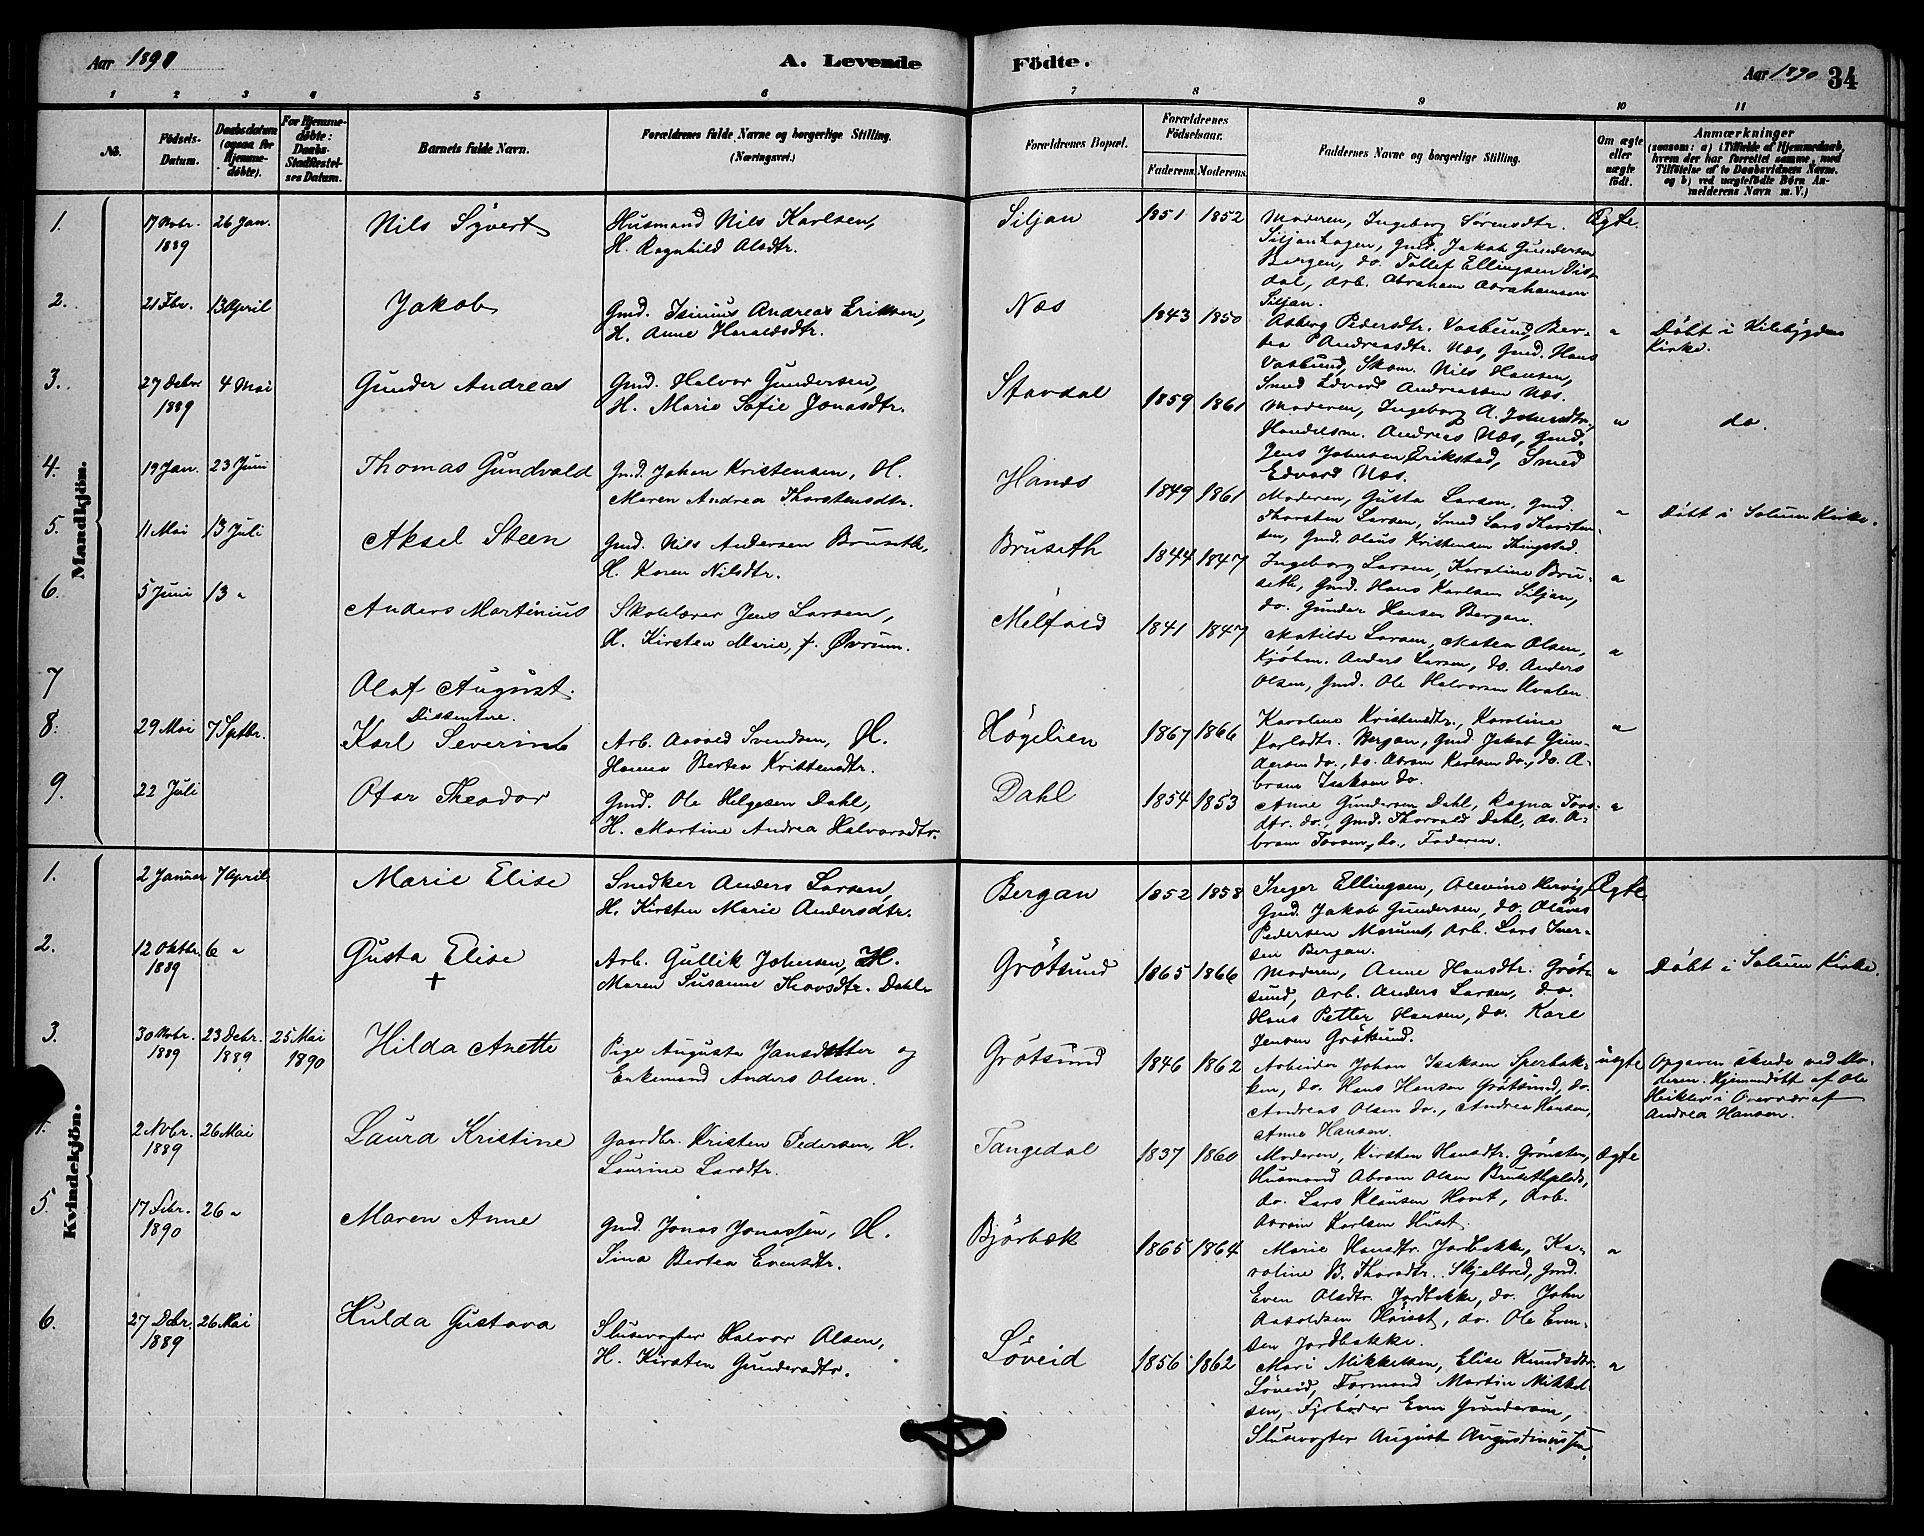 SAKO, Solum kirkebøker, G/Gb/L0003: Klokkerbok nr. II 3, 1880-1898, s. 34